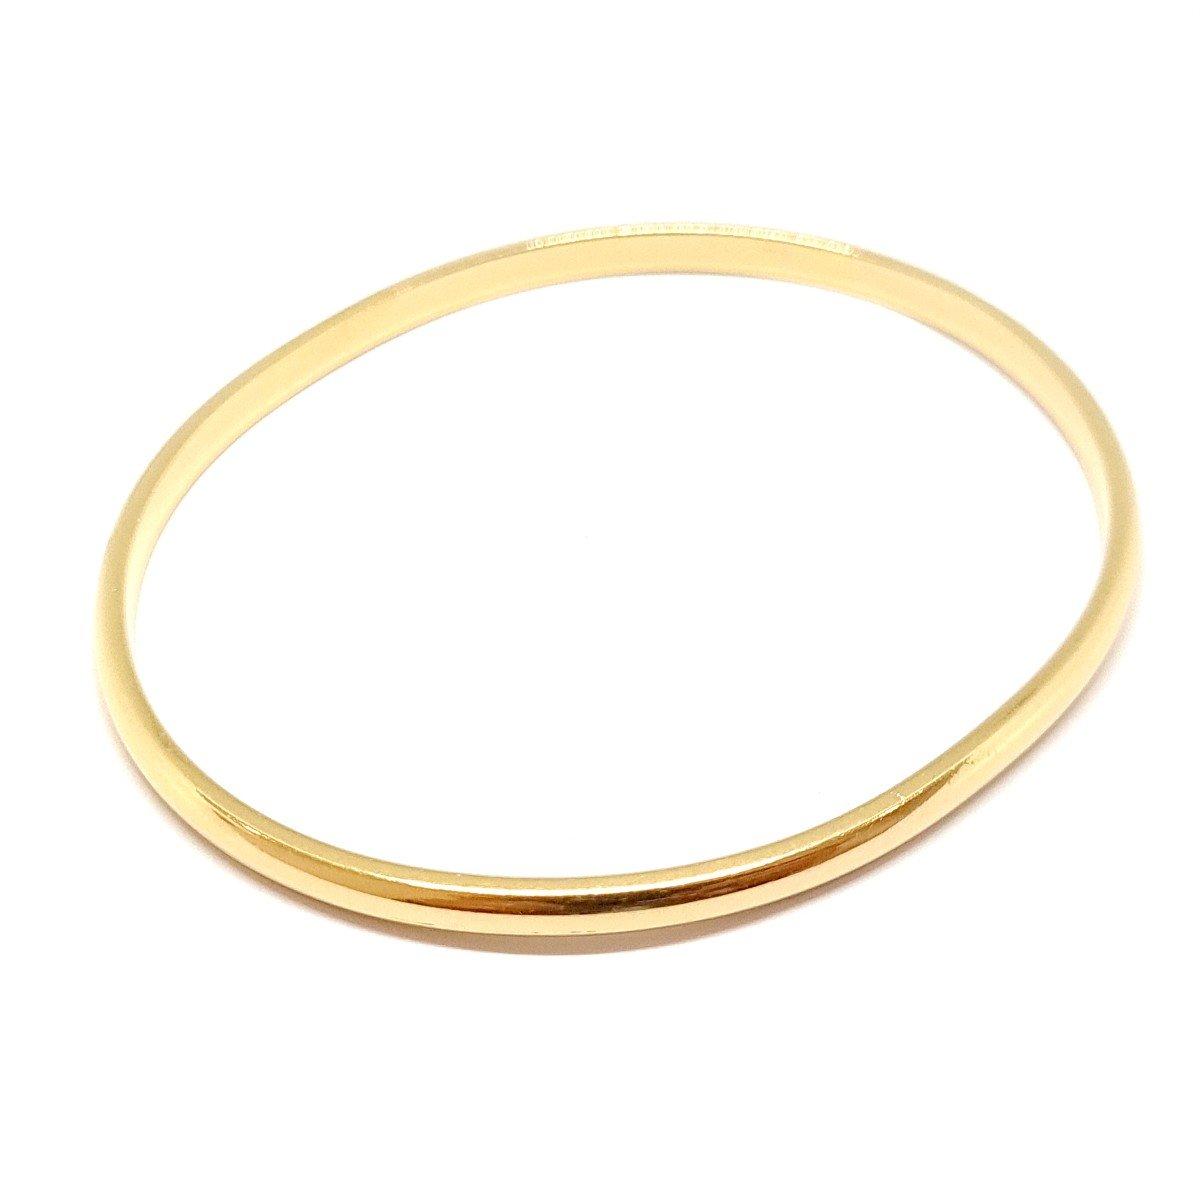 18k Yellow Gold Rigid Bangle Bracelet